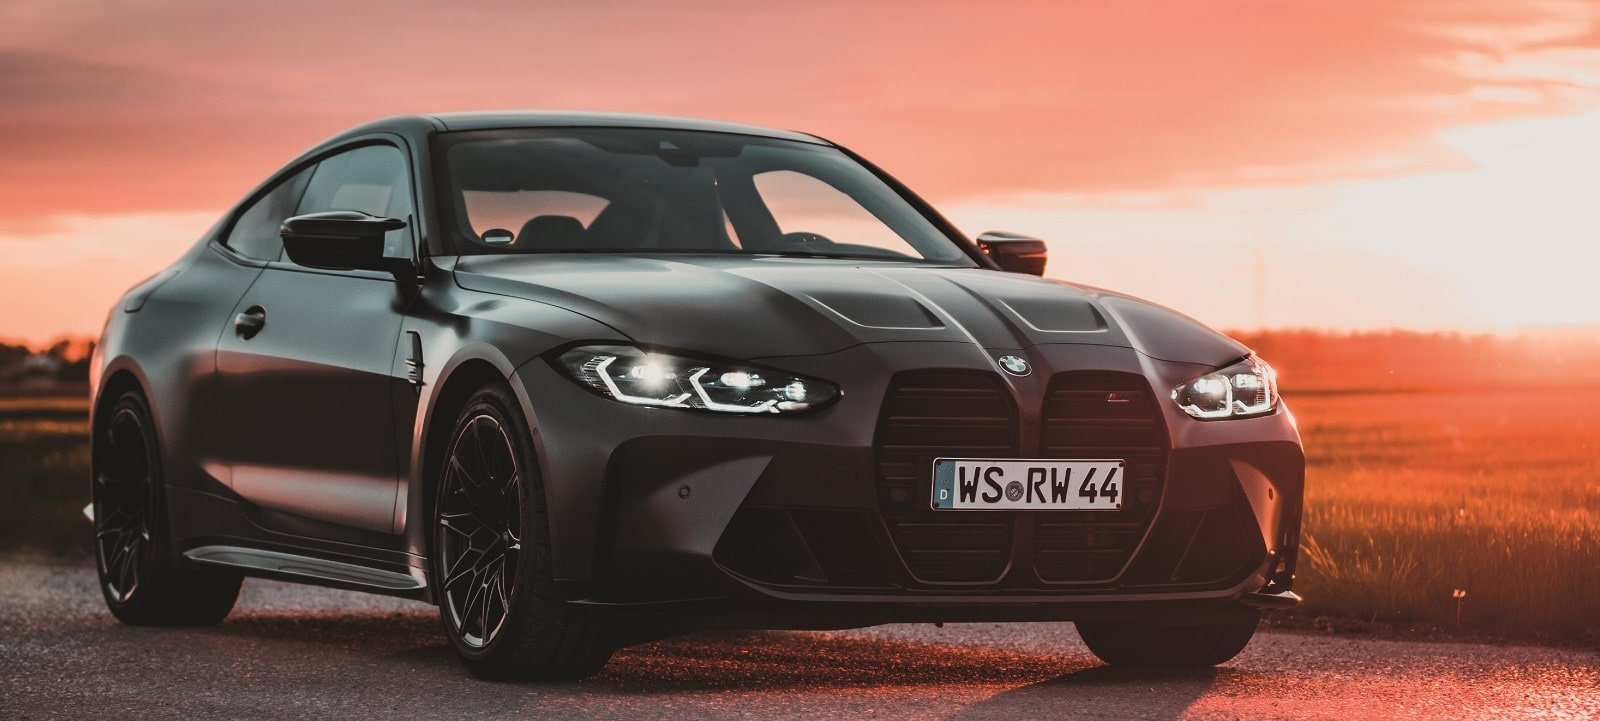 BMW Richard Wagner